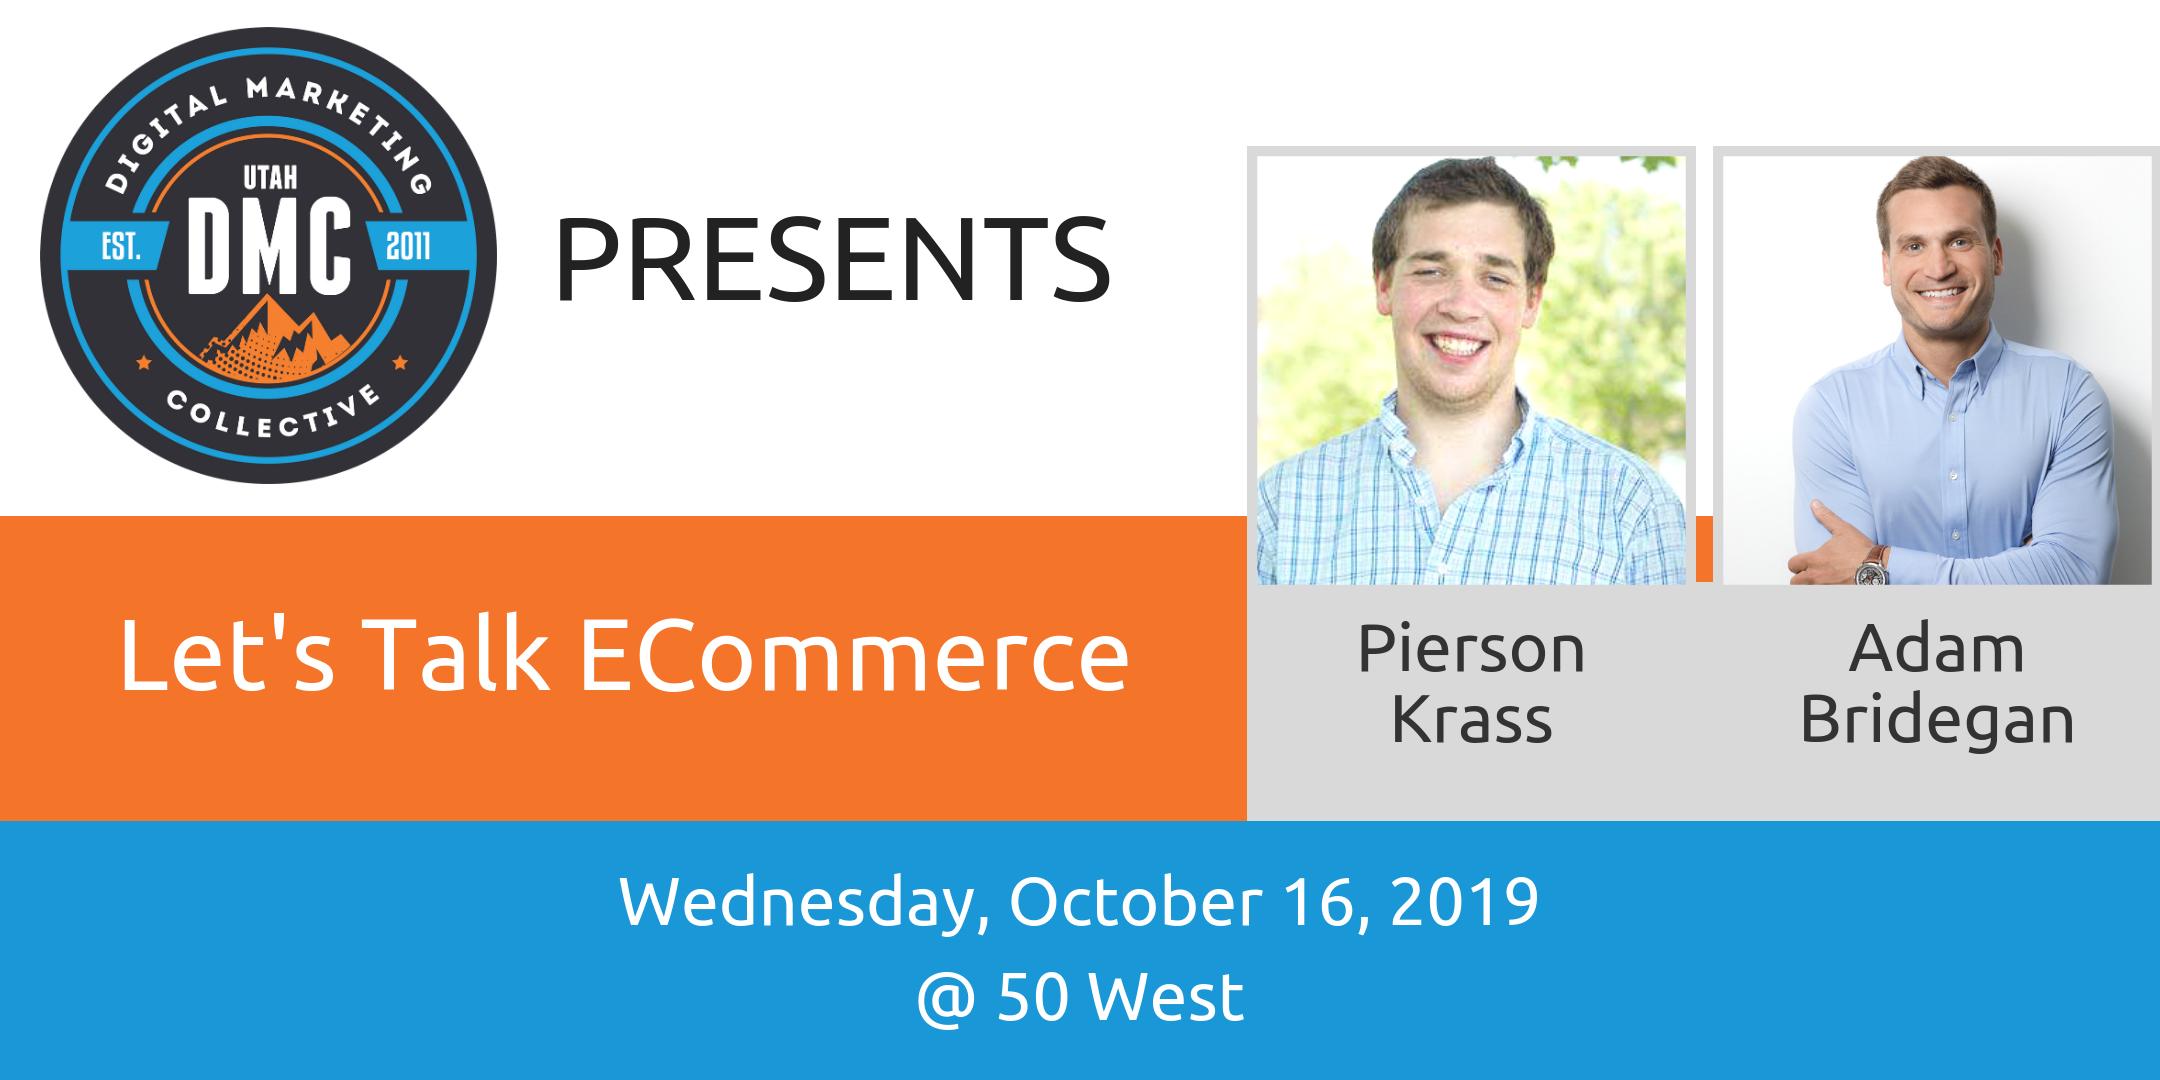 Utah DMC October 2019 eCommerce